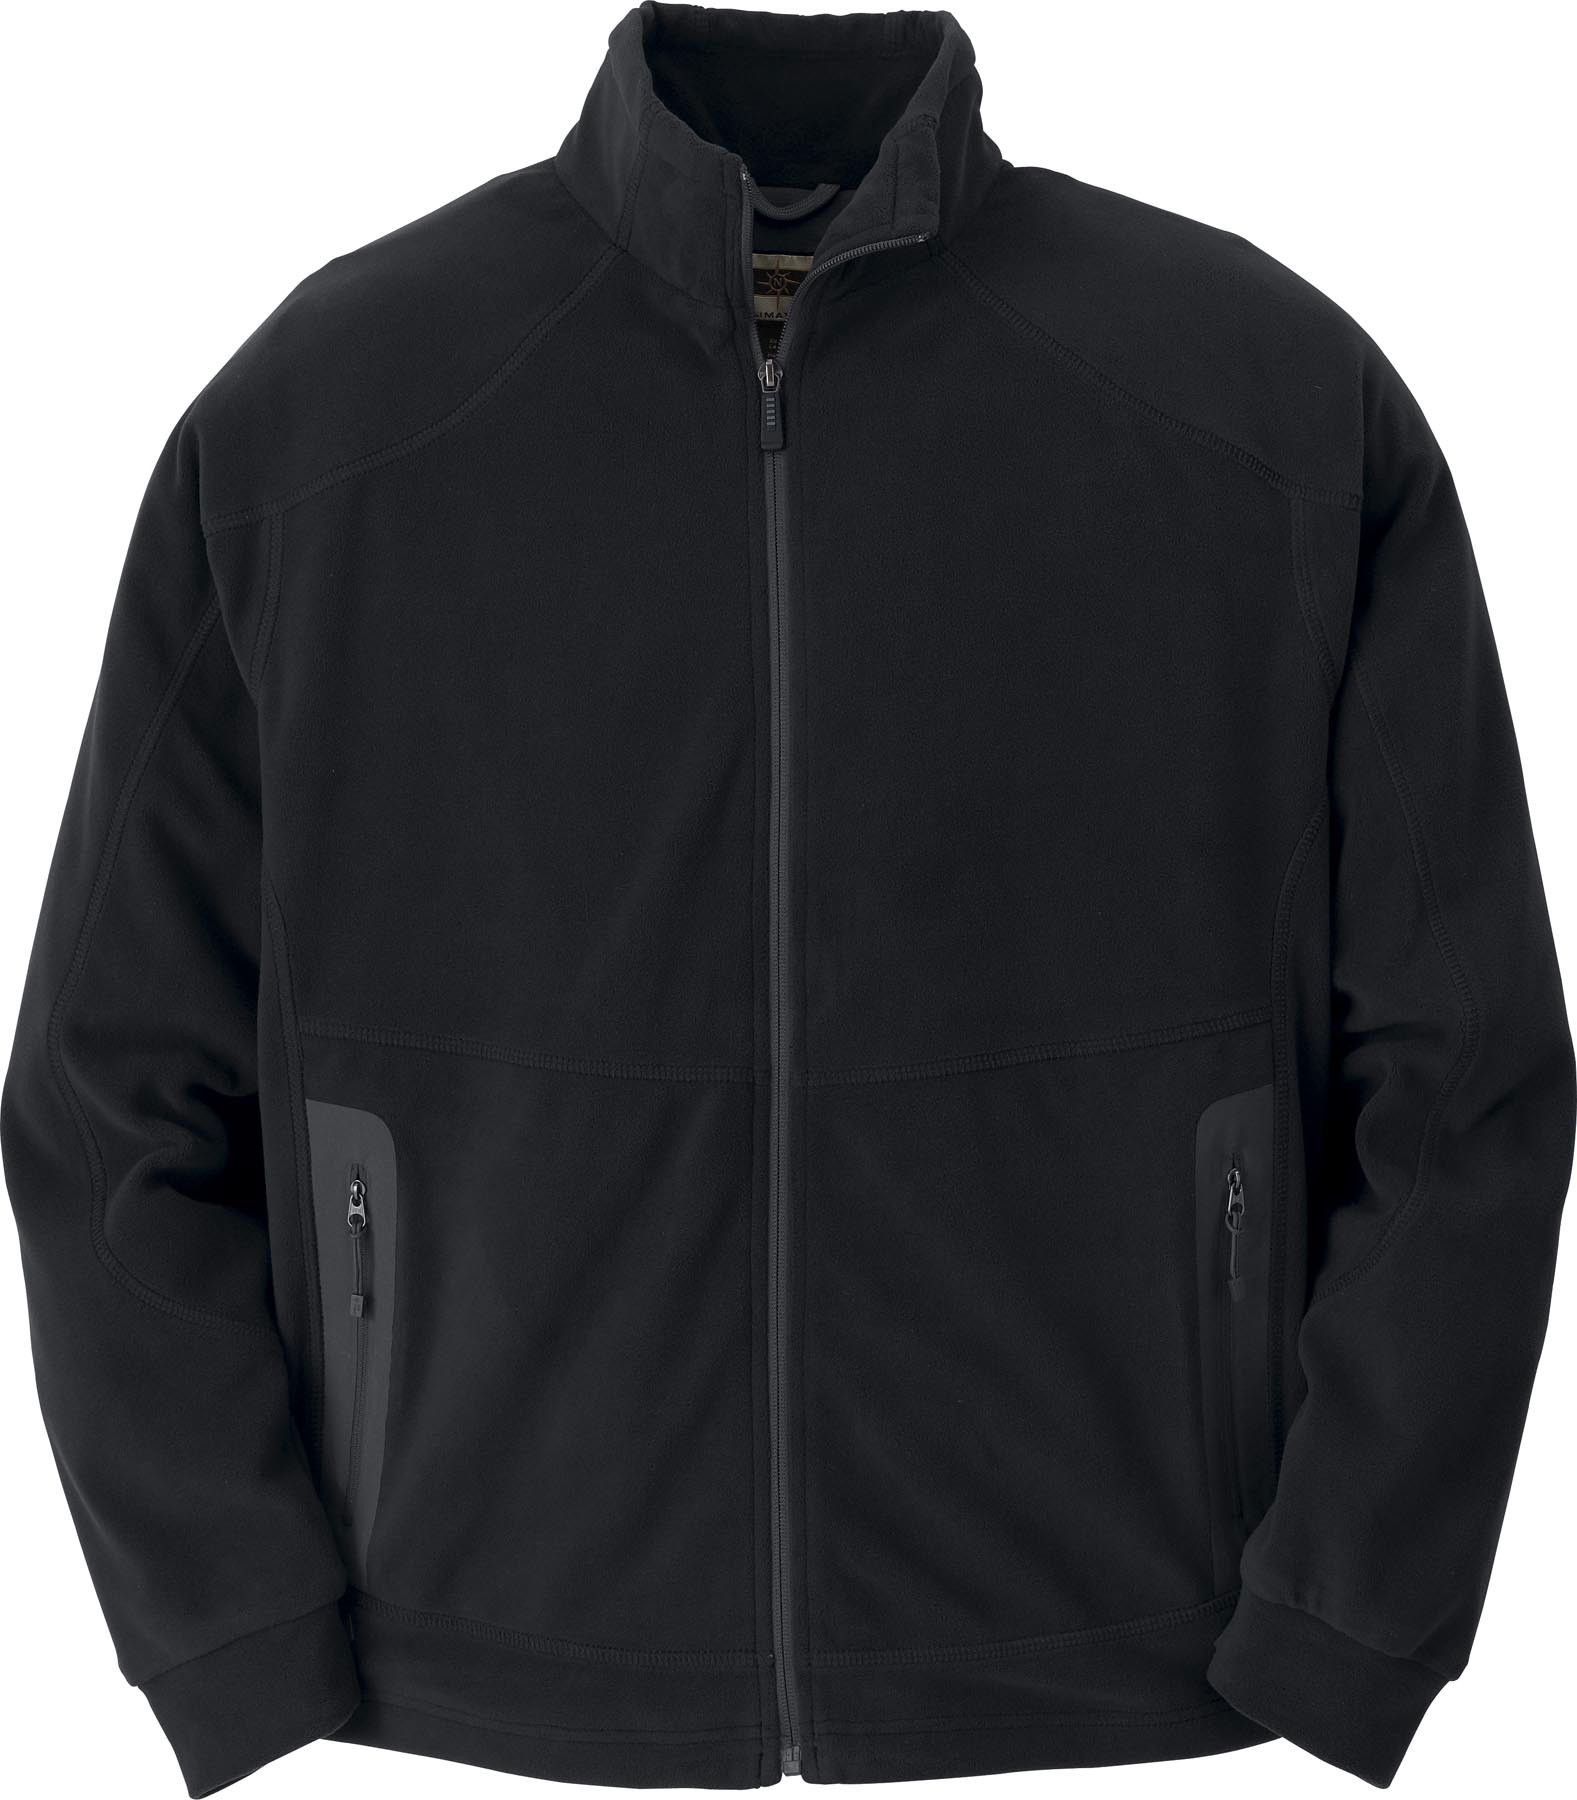 Ash City Microfleece 88134 - Men's Jacket With Windsmarttm Technology